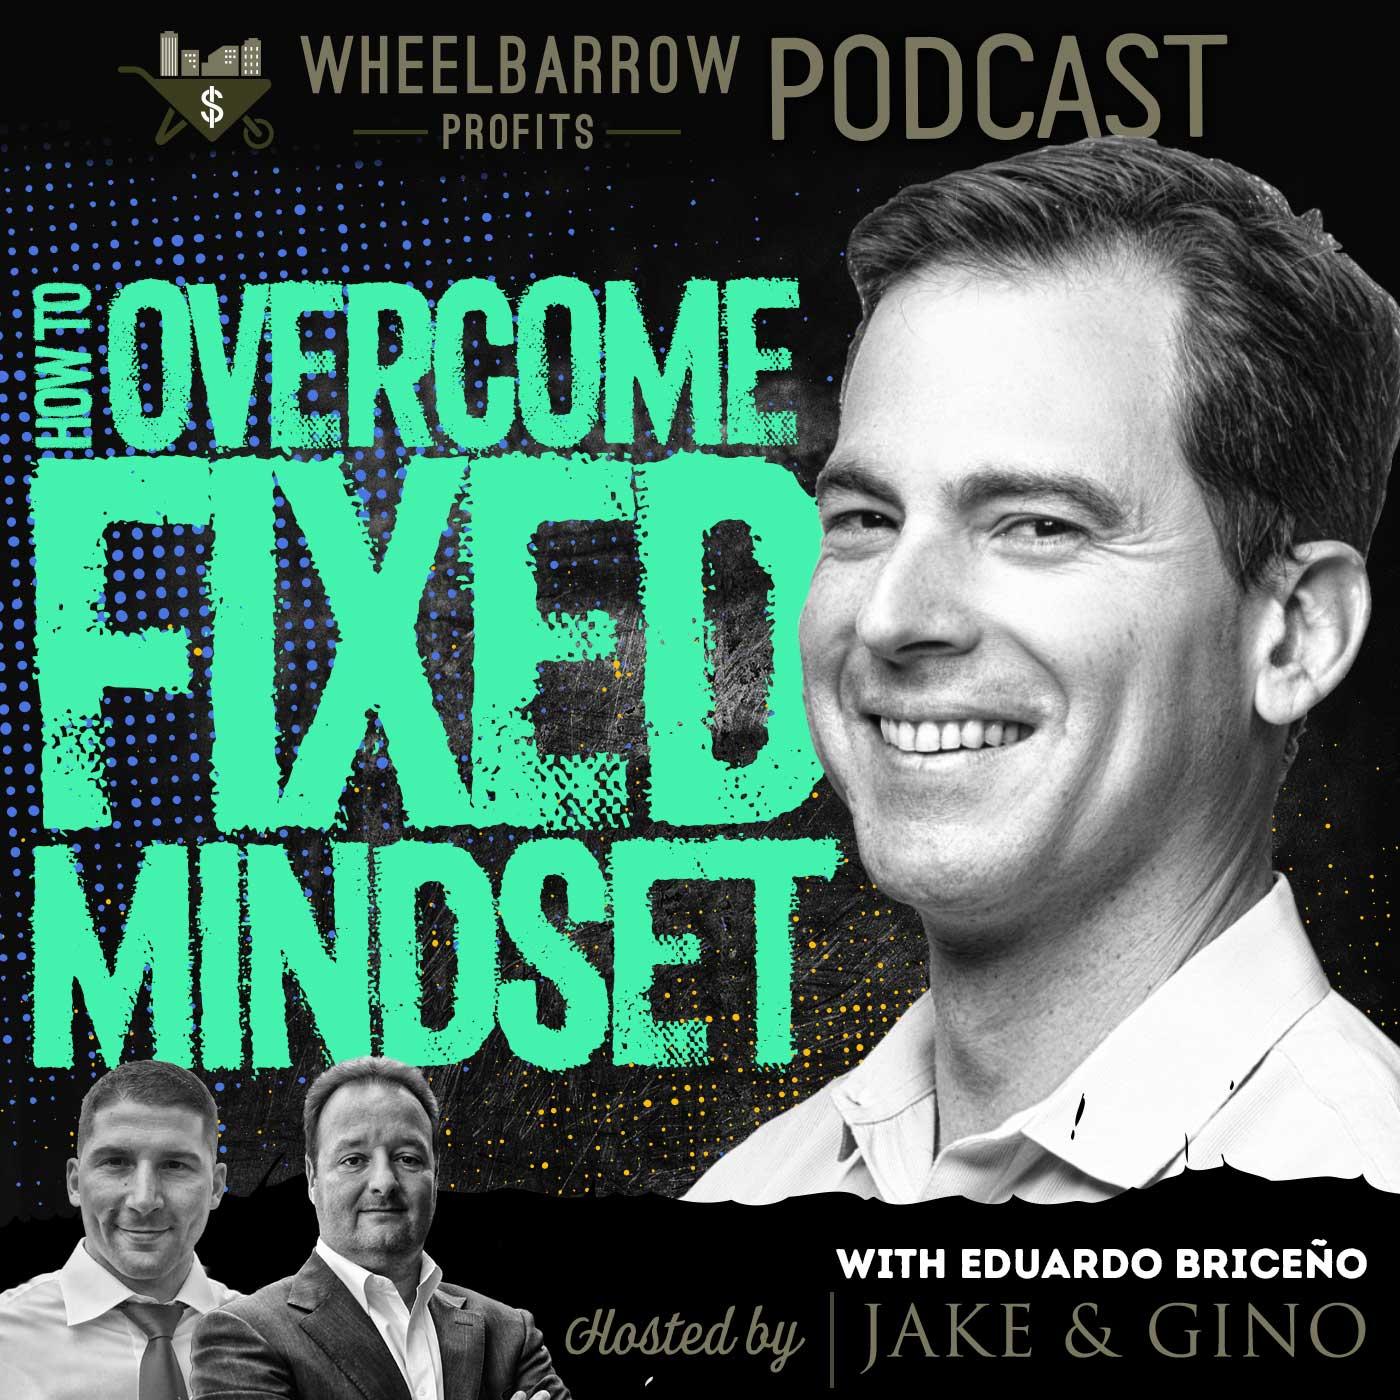 WBP - How To Overcome Fixed Mindset With Eduardo Briceño